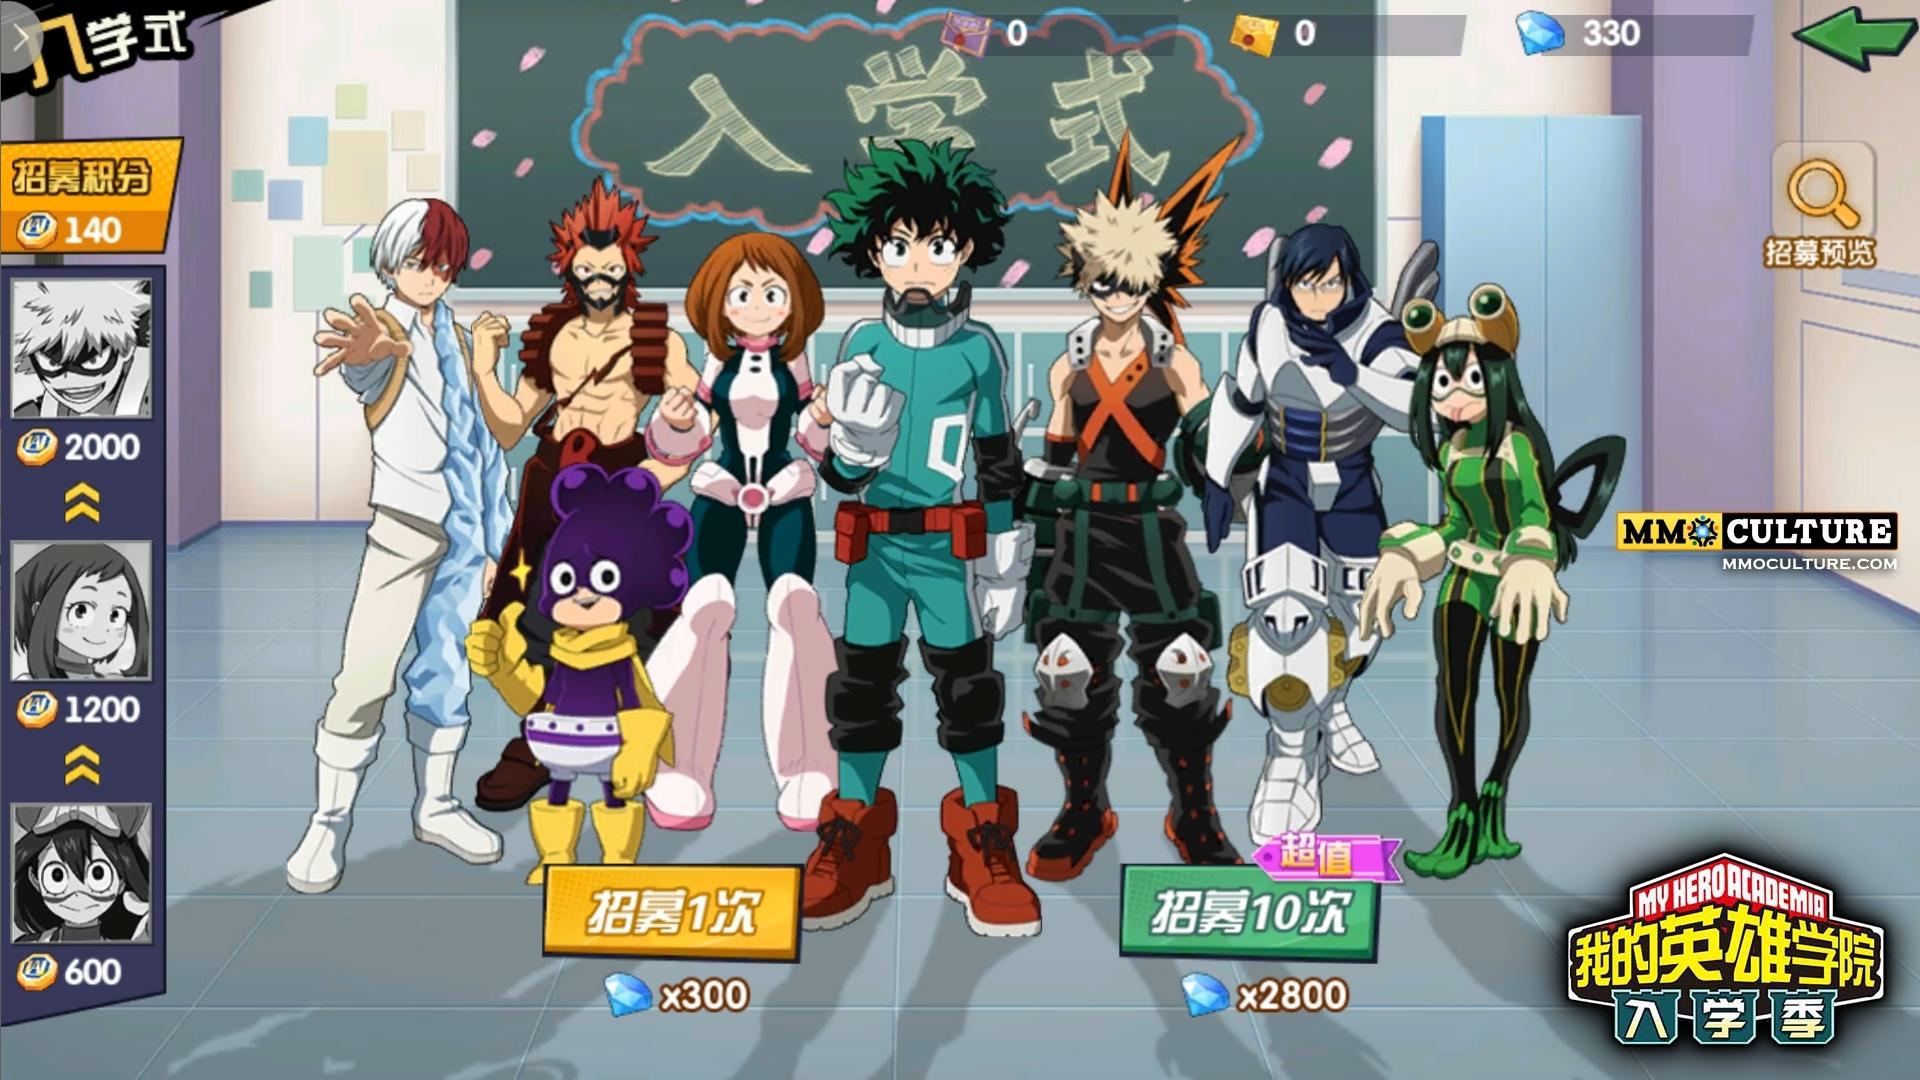 My Hero Academia Mobile 2842019 5